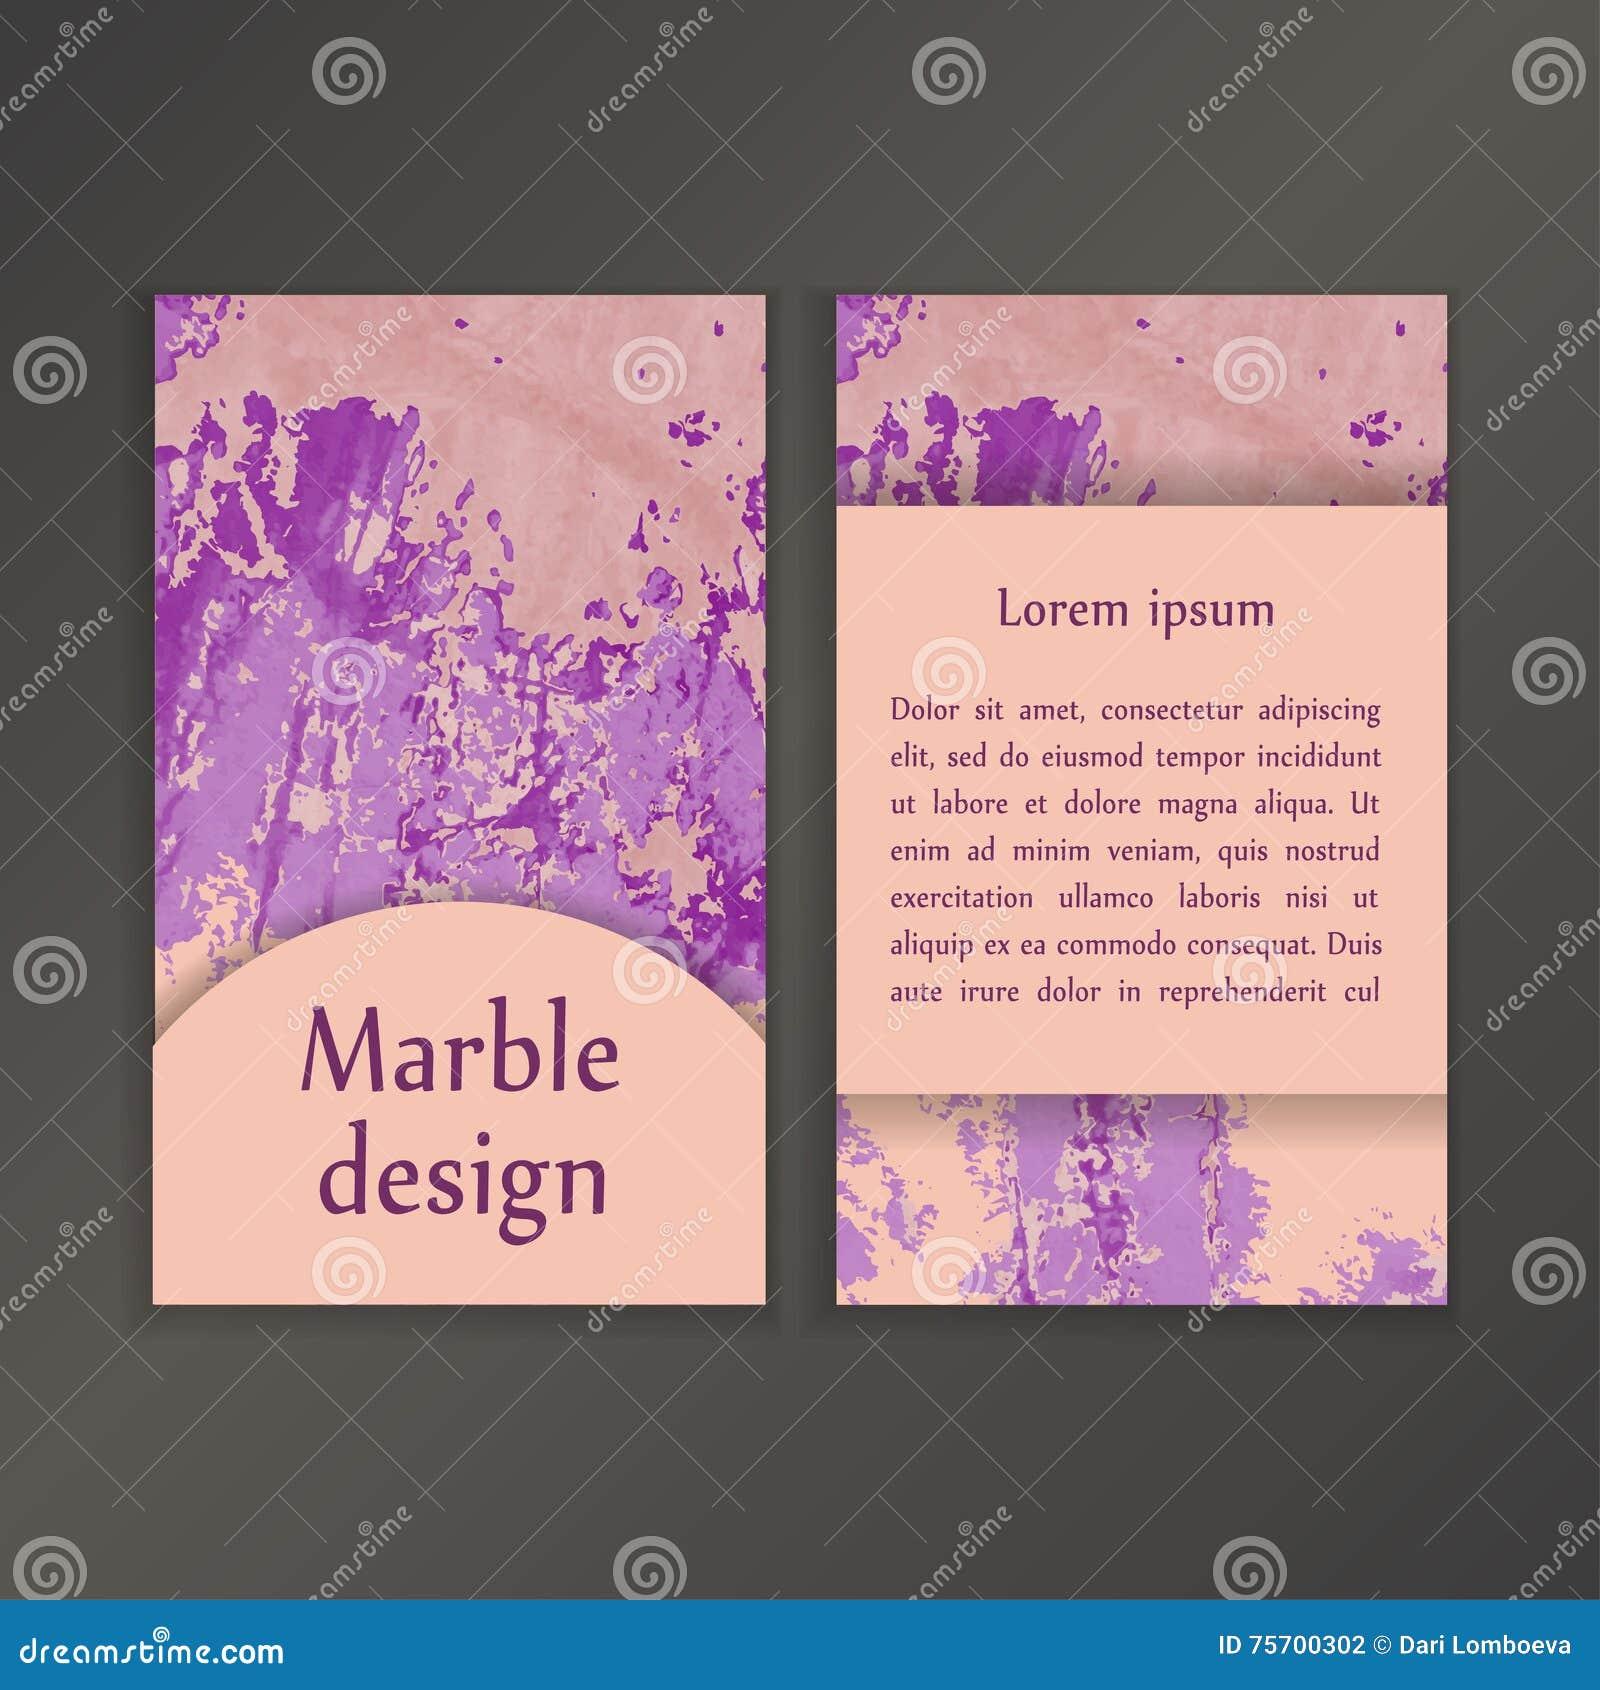 Abstract creative card templates weddings menu invitations download abstract creative card templates weddings menu invitations birthday business cards colourmoves